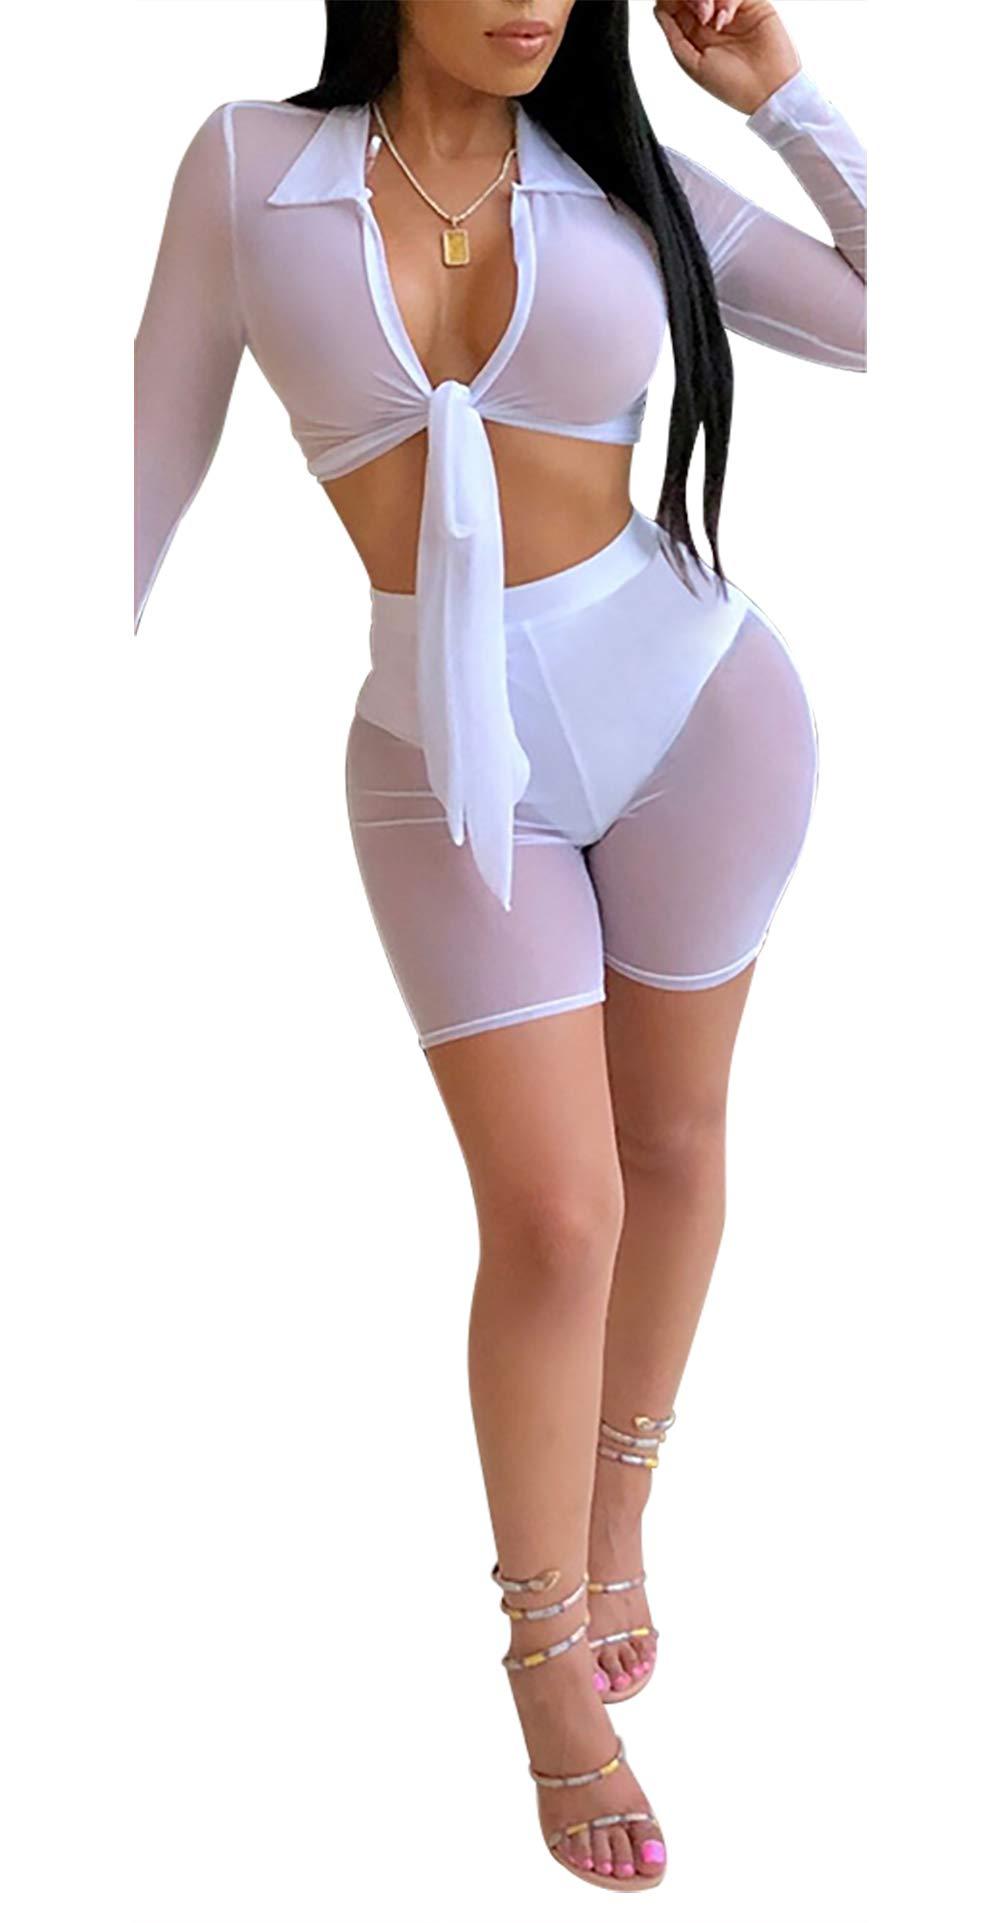 DingAng Sexy 2 Piece Set Long Sleeve Mesh See Through Crop Top Bodycon Pants Nightclub Set